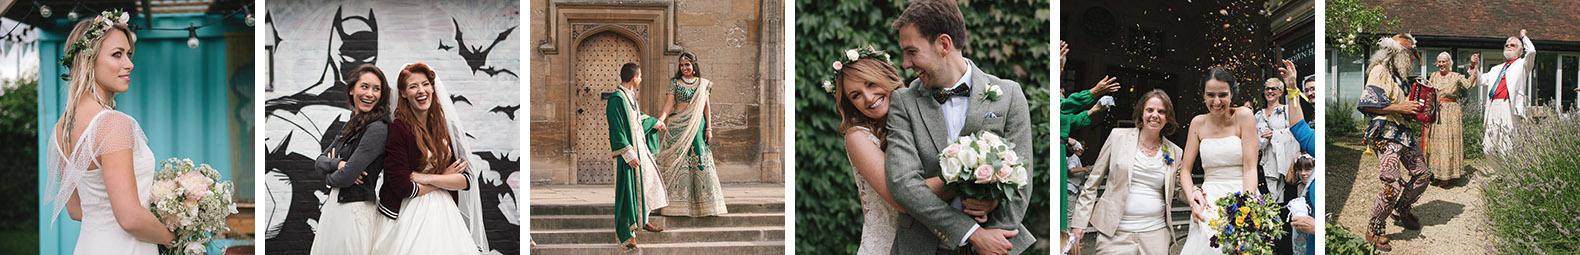 Wedding Photography Instagram Feed